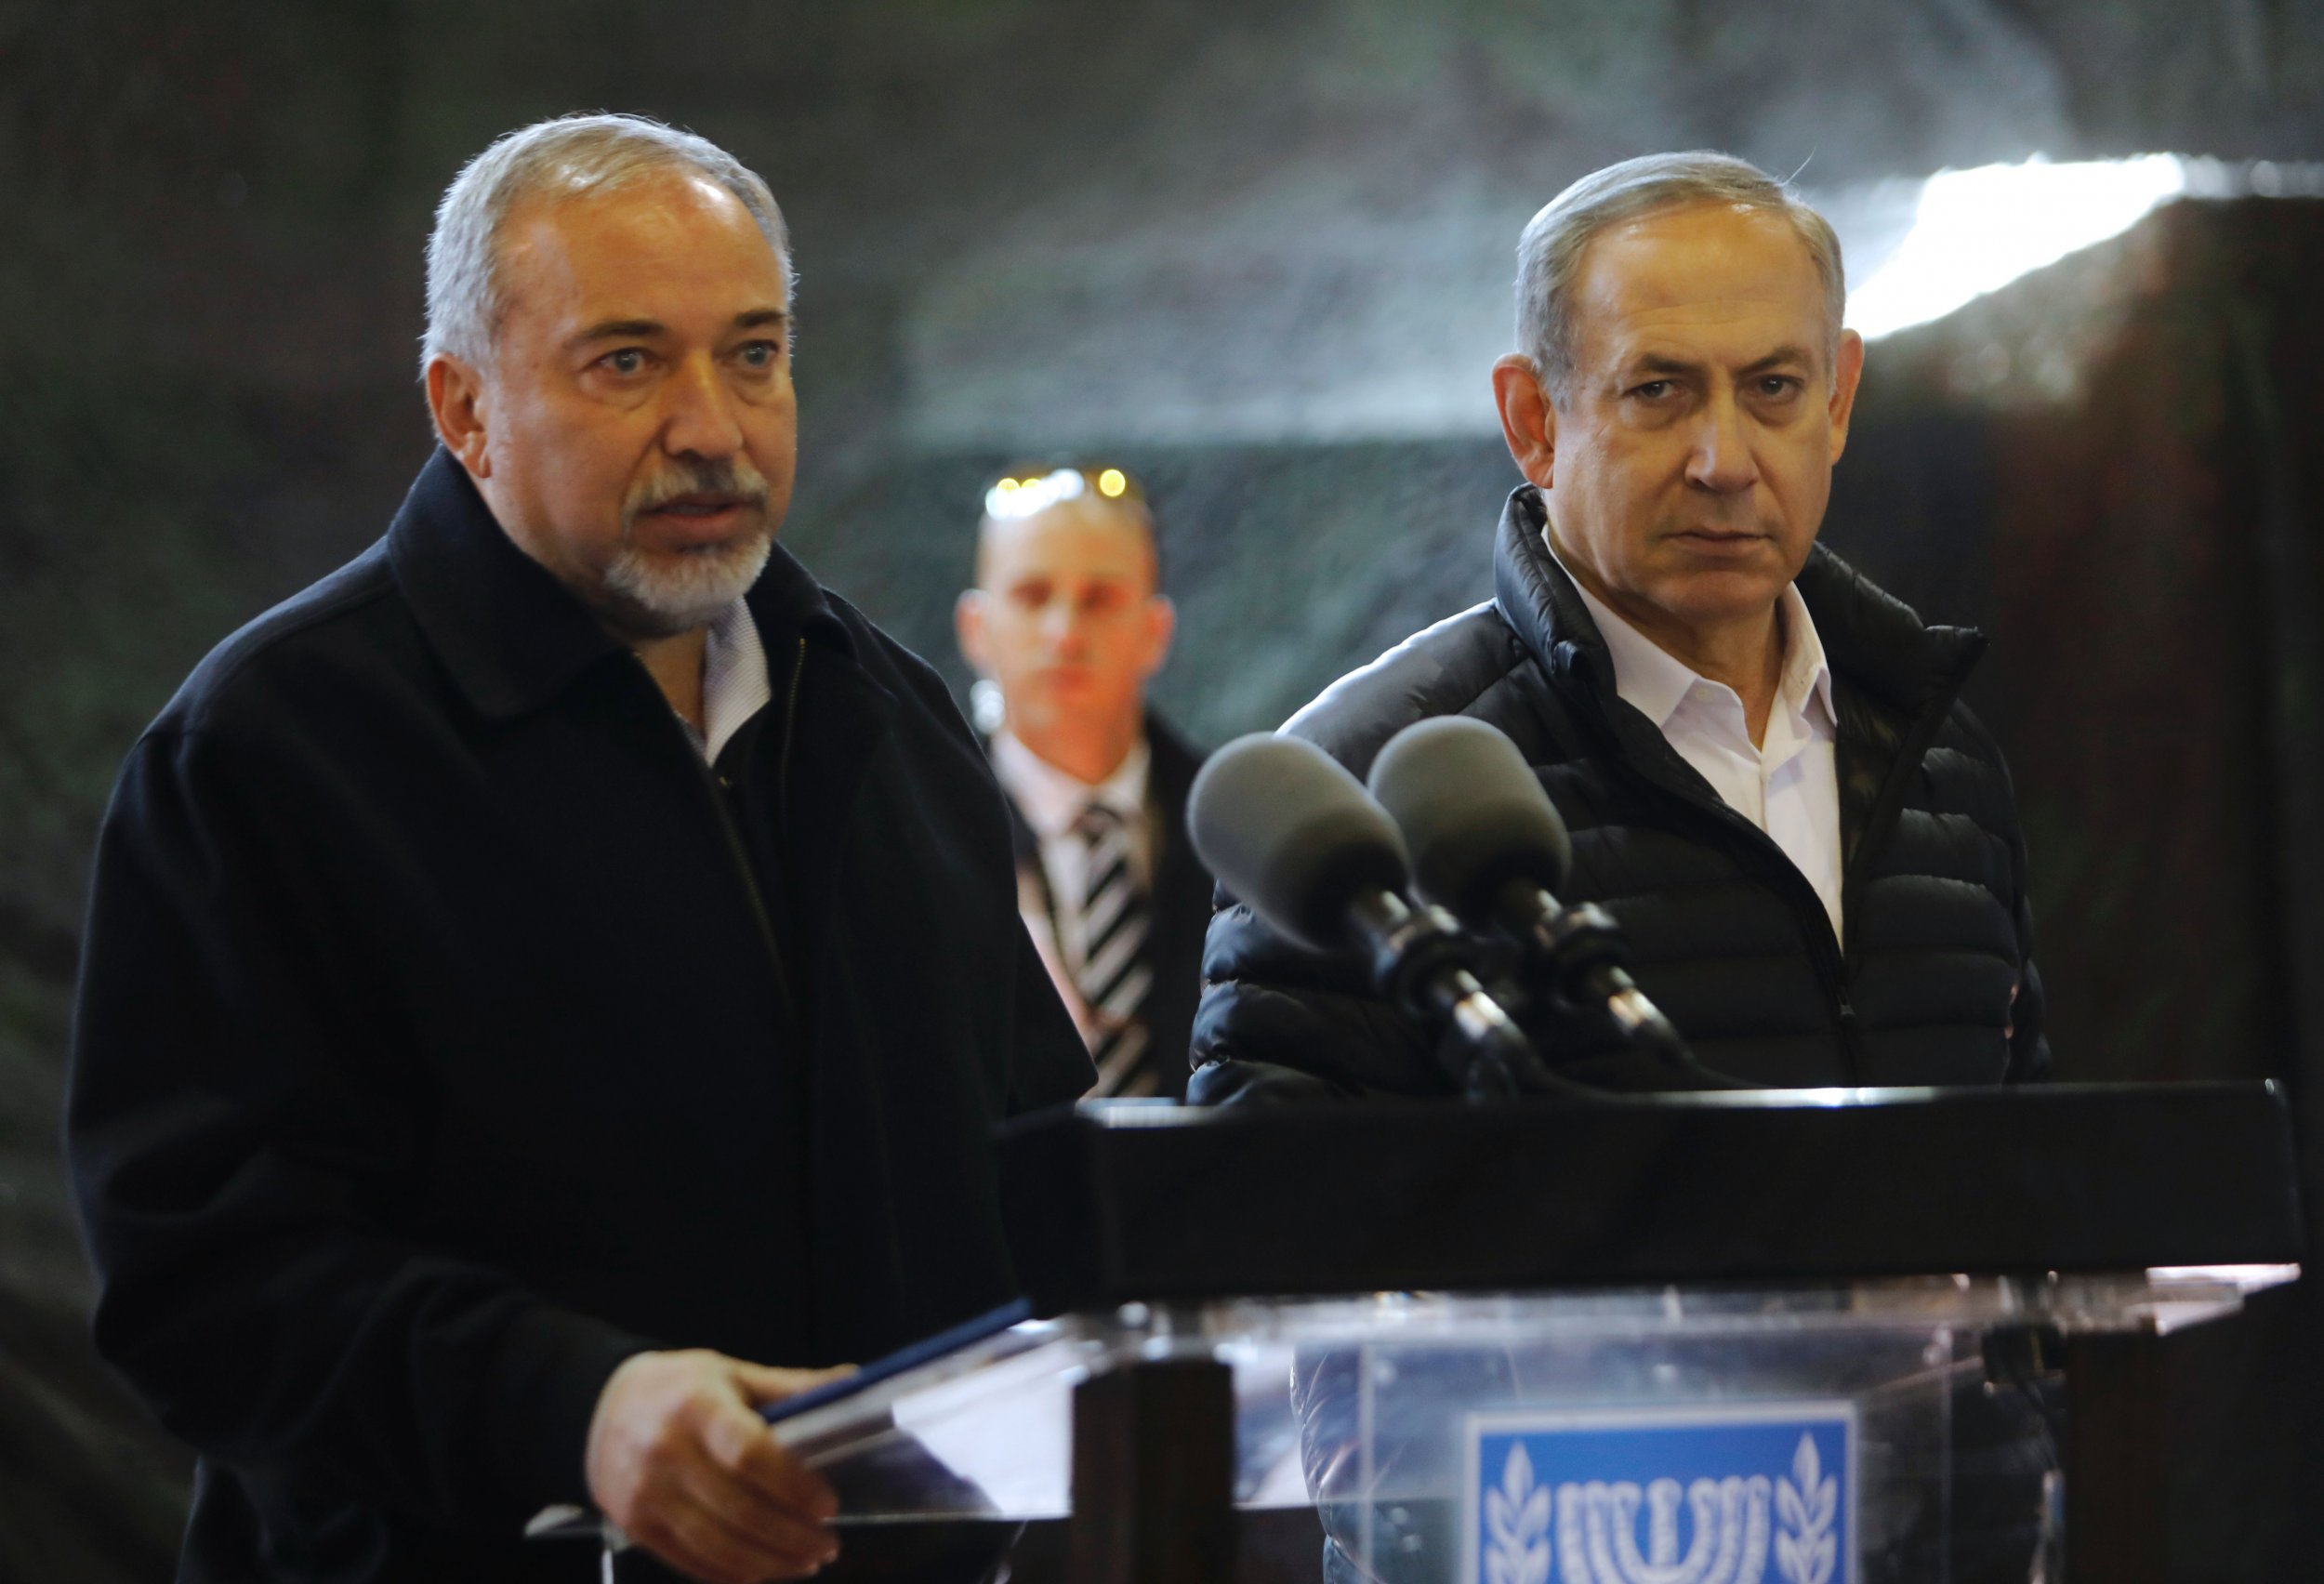 Lieberman and Netanyahu